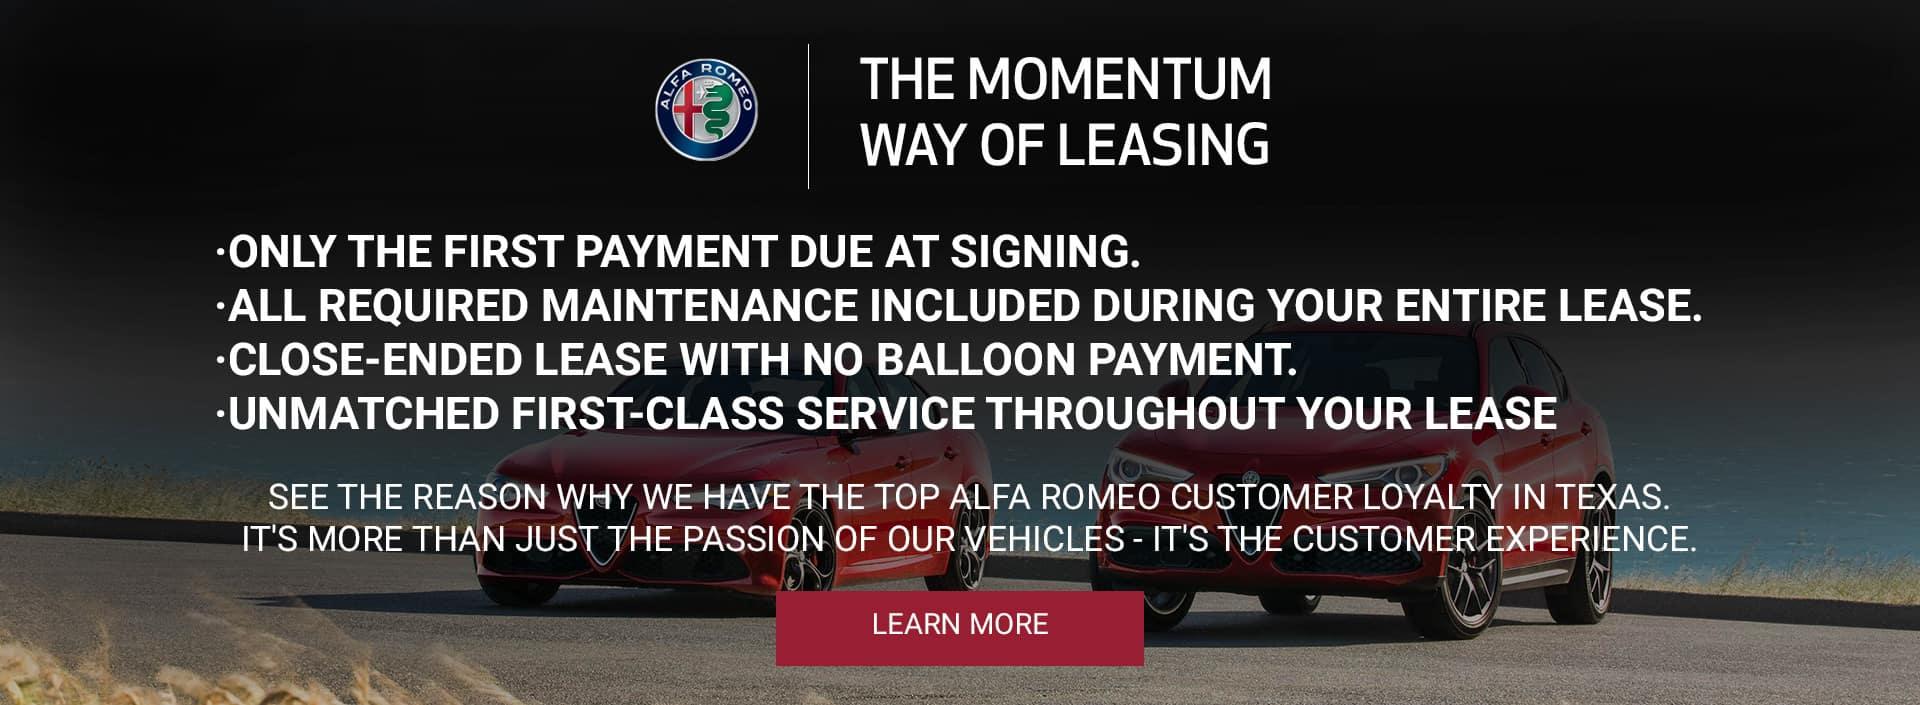 Momentum Way of Leasing